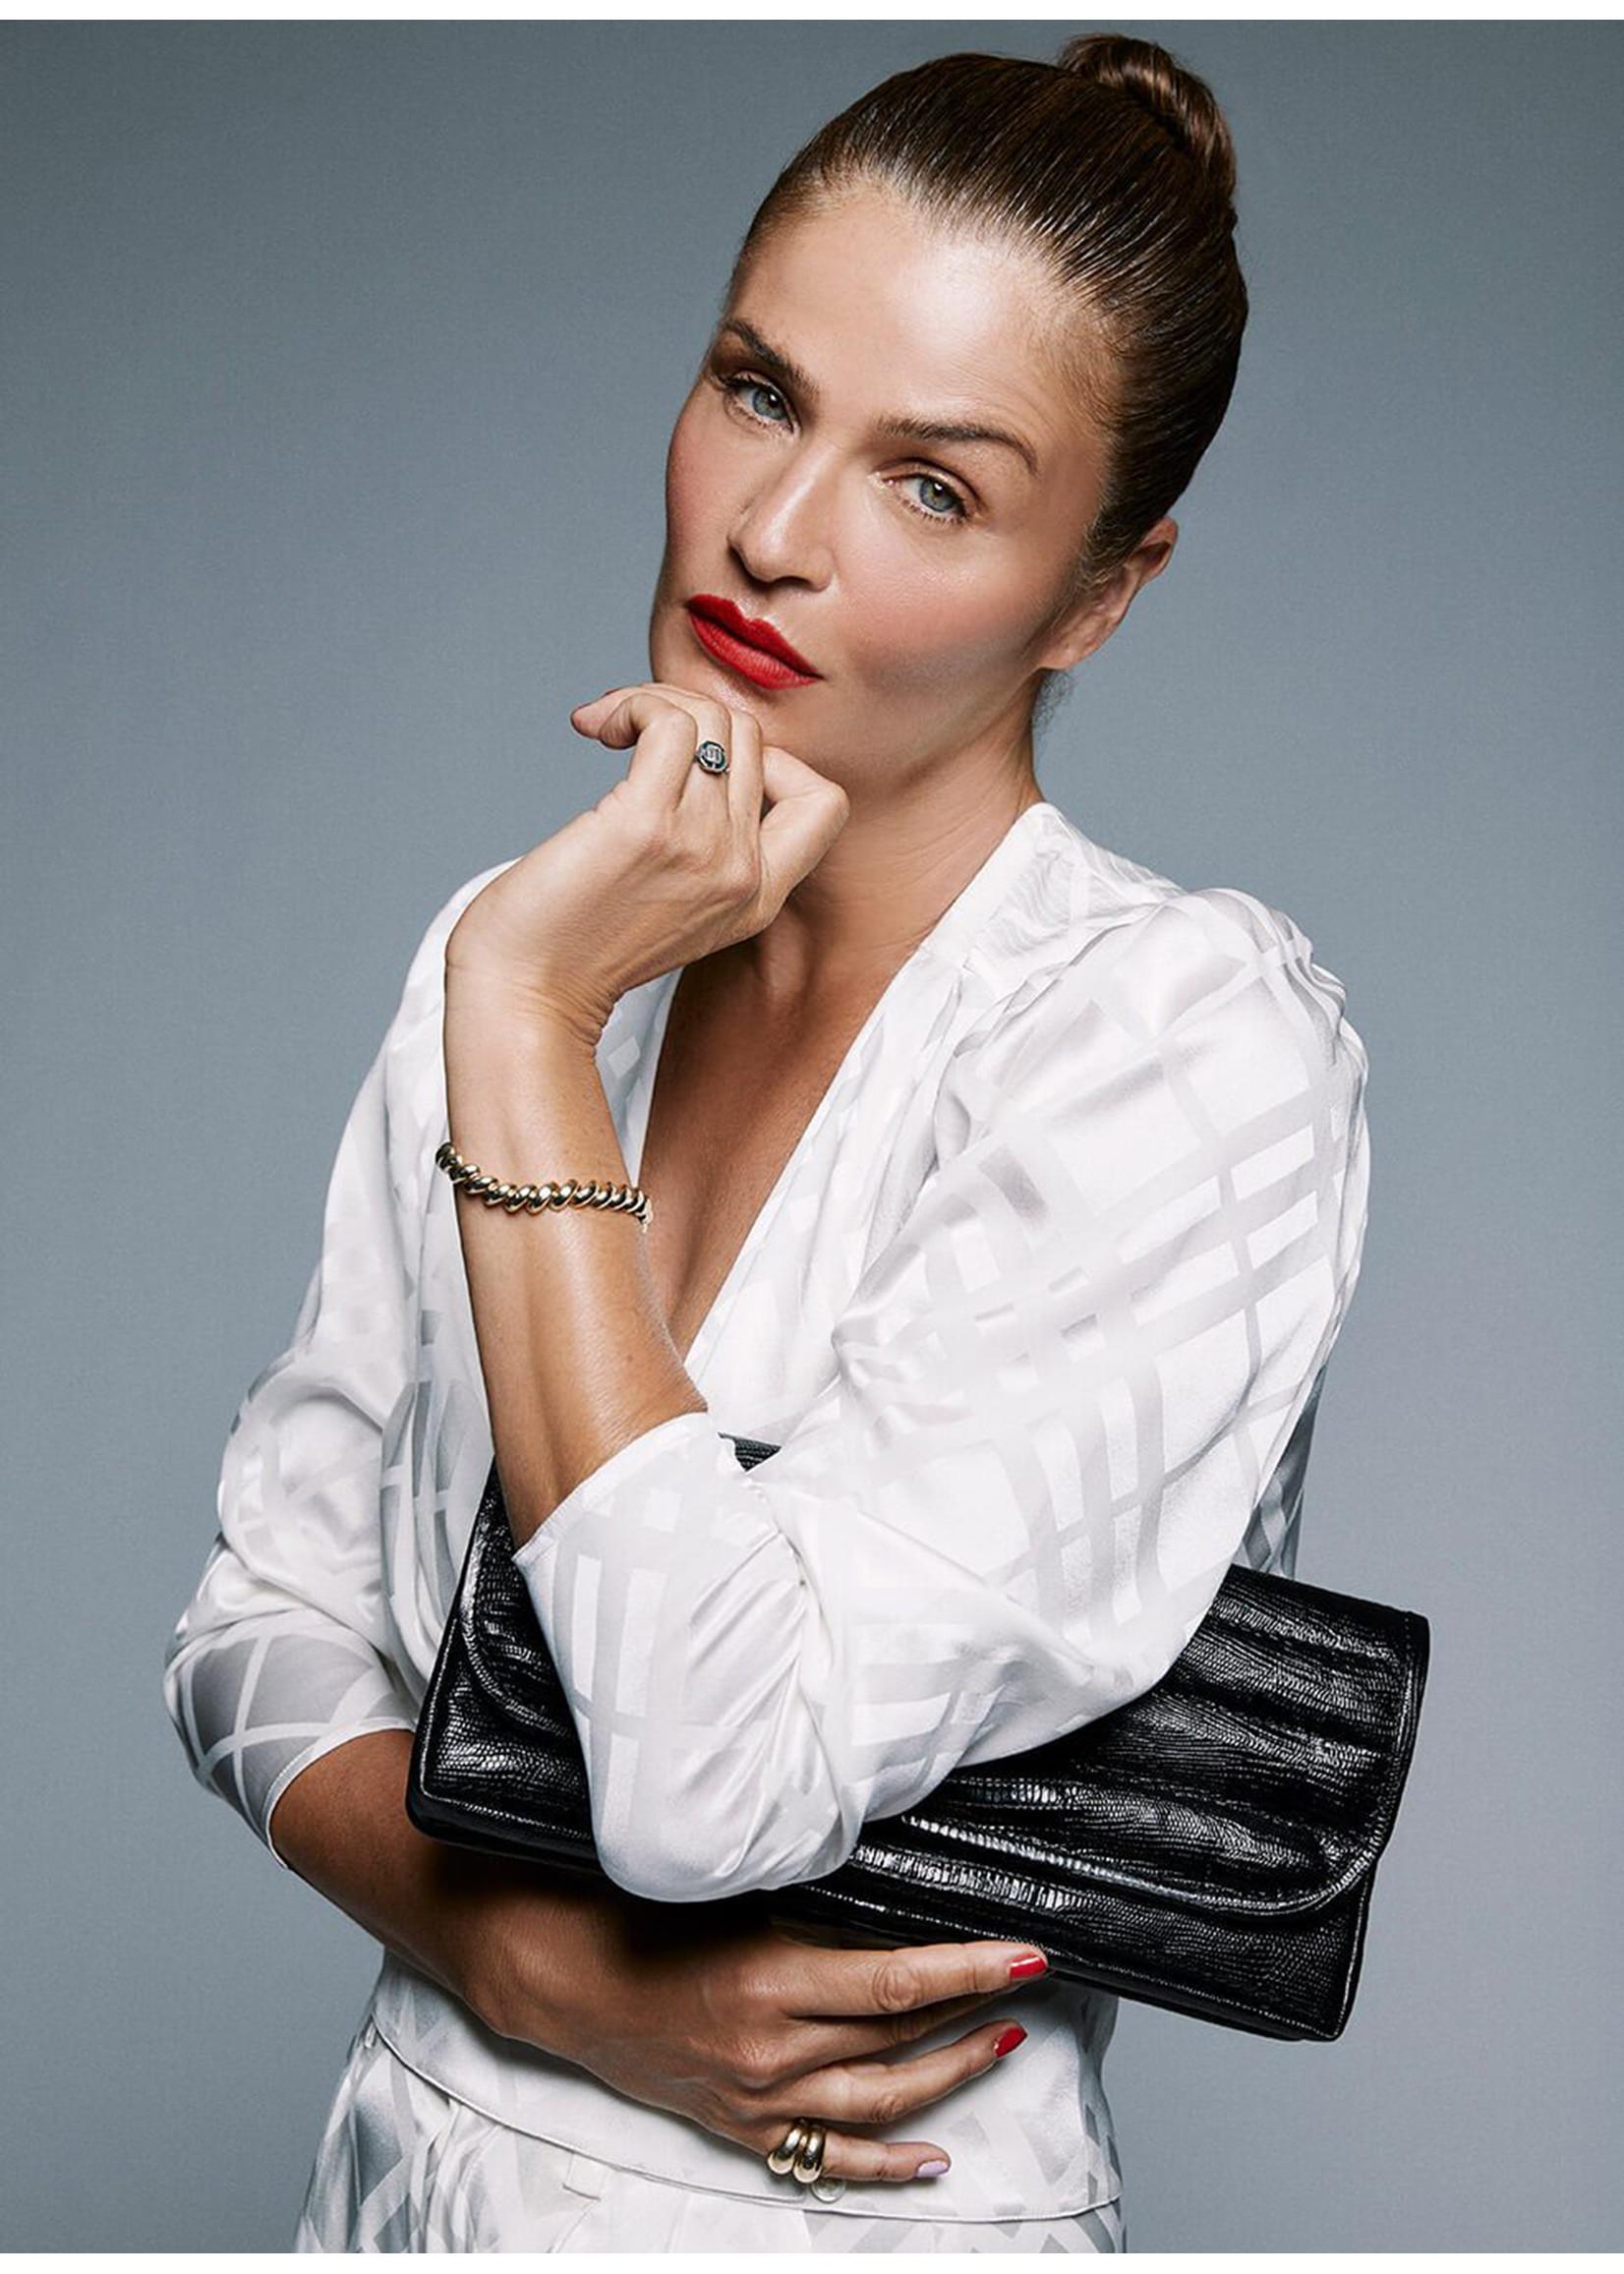 Anine Bing Natasha clutch black